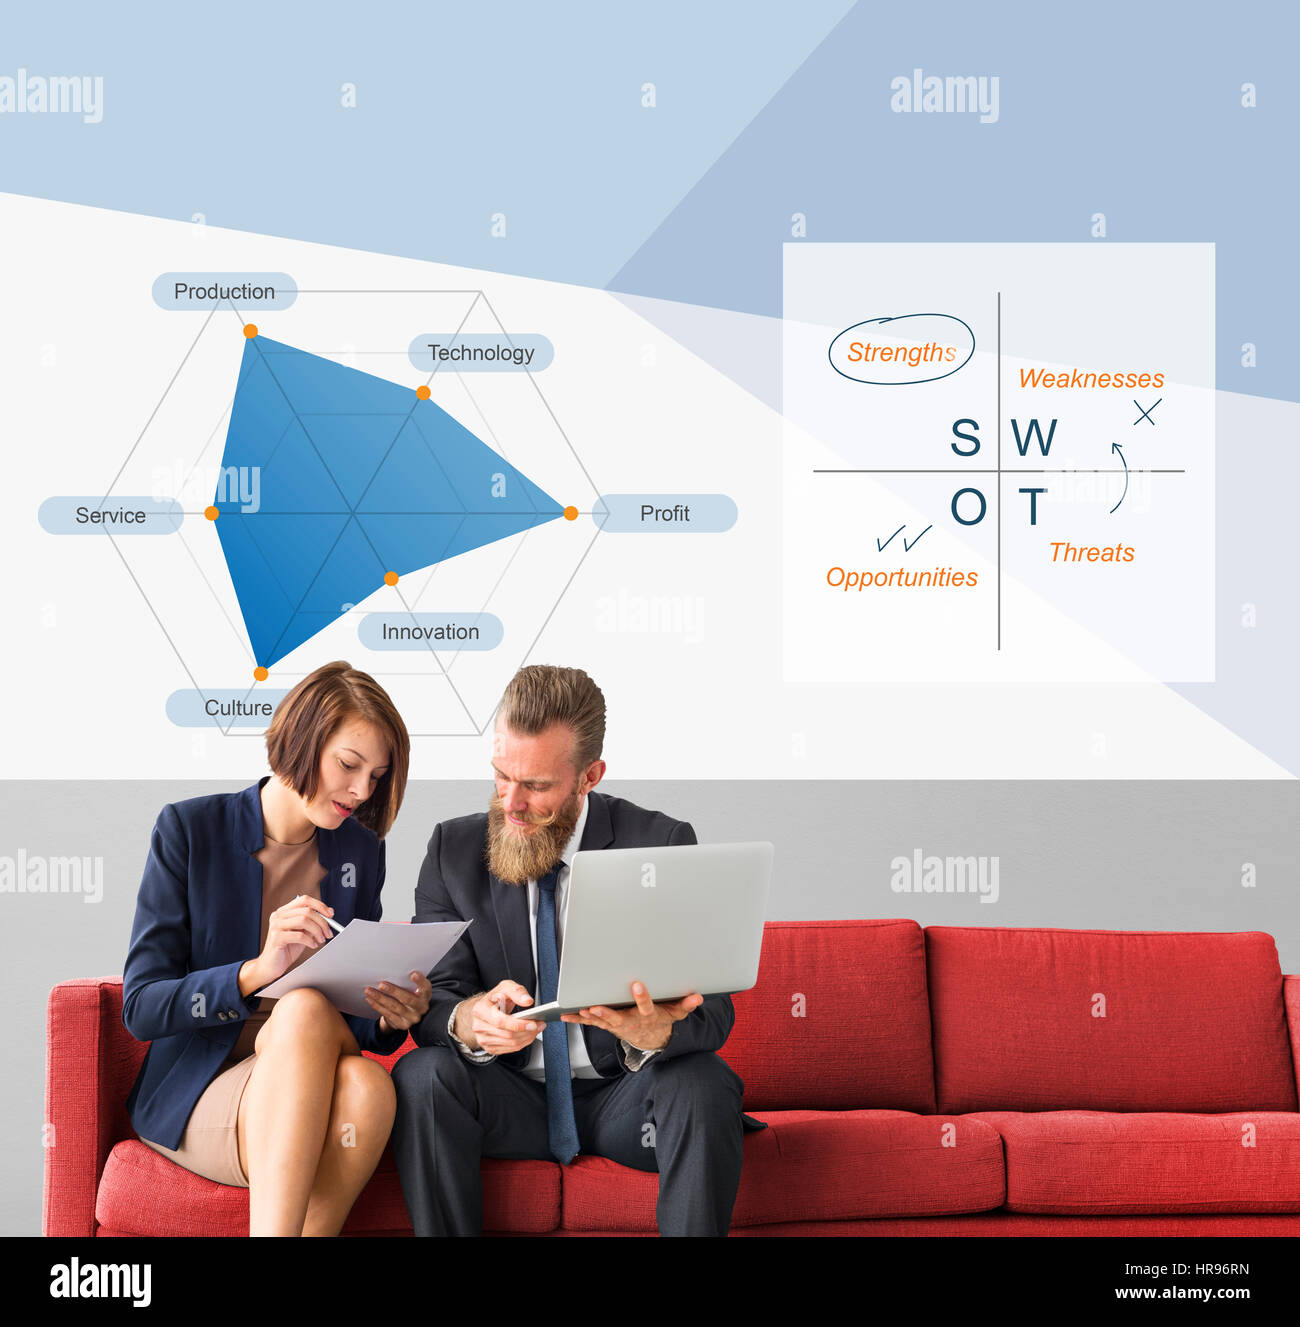 Analysis Innovation Opportunities Strengths Strategic - Stock Image